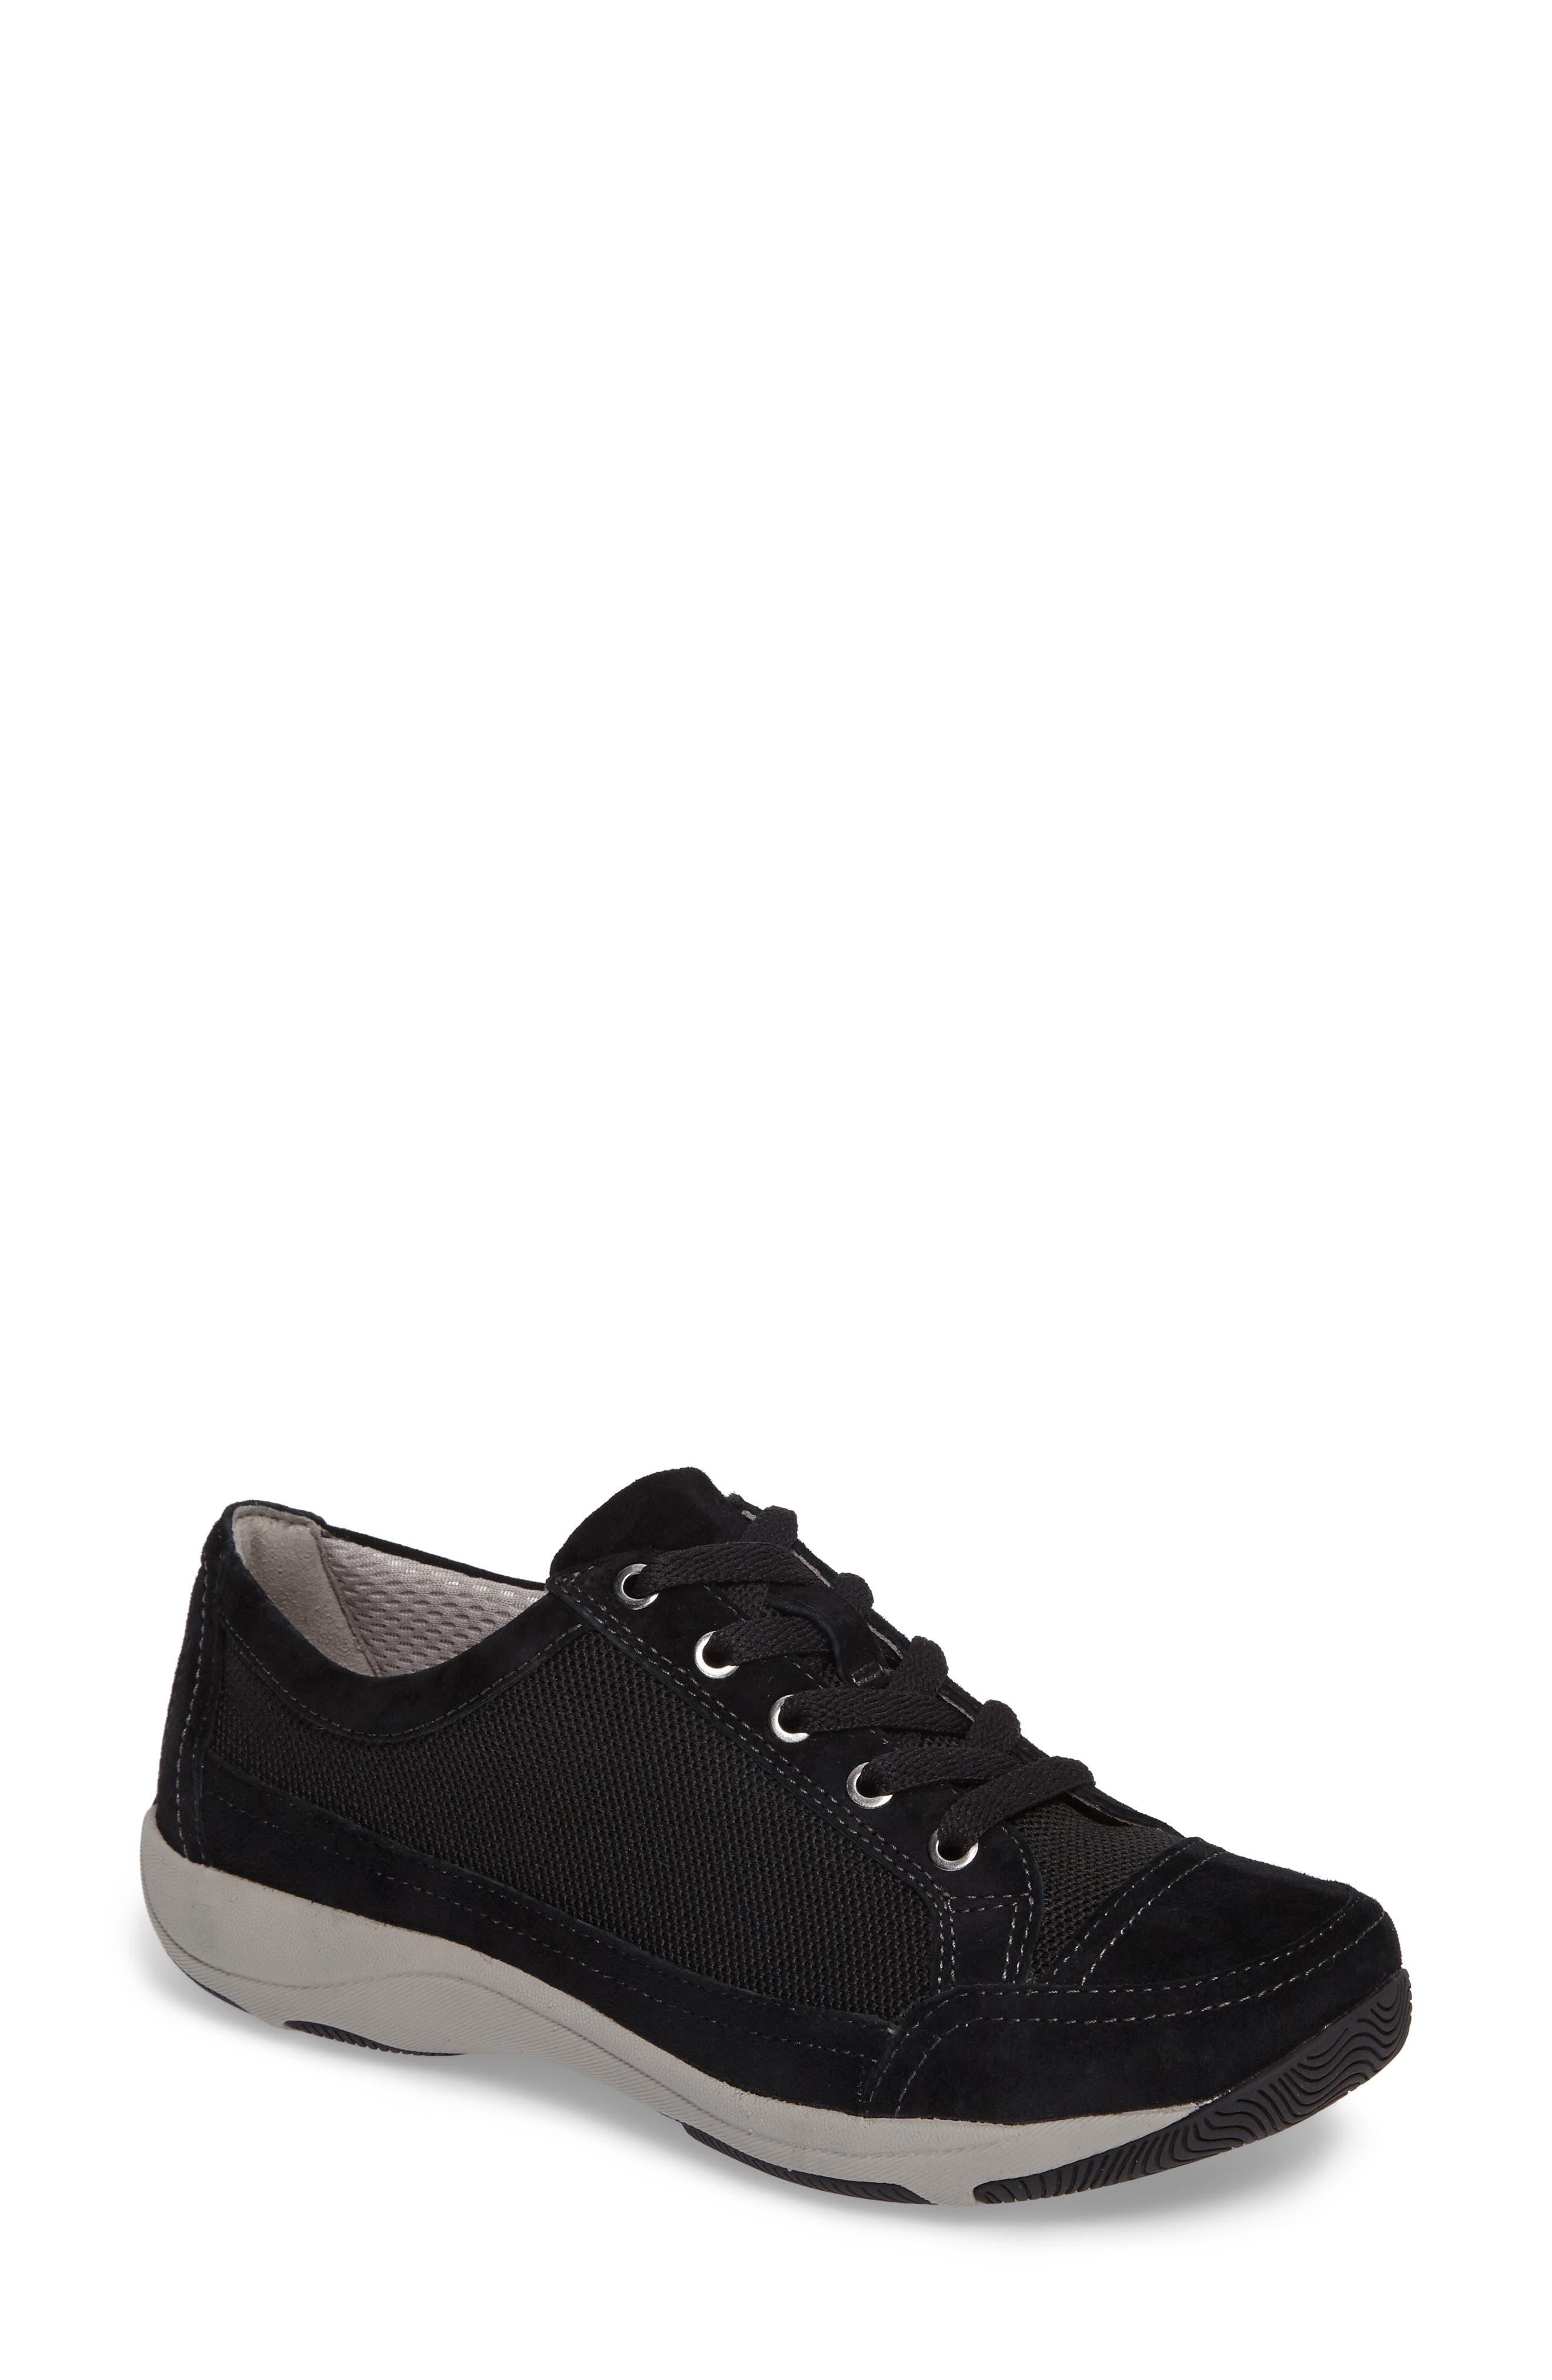 Harmony Sneaker,                             Main thumbnail 1, color,                             001